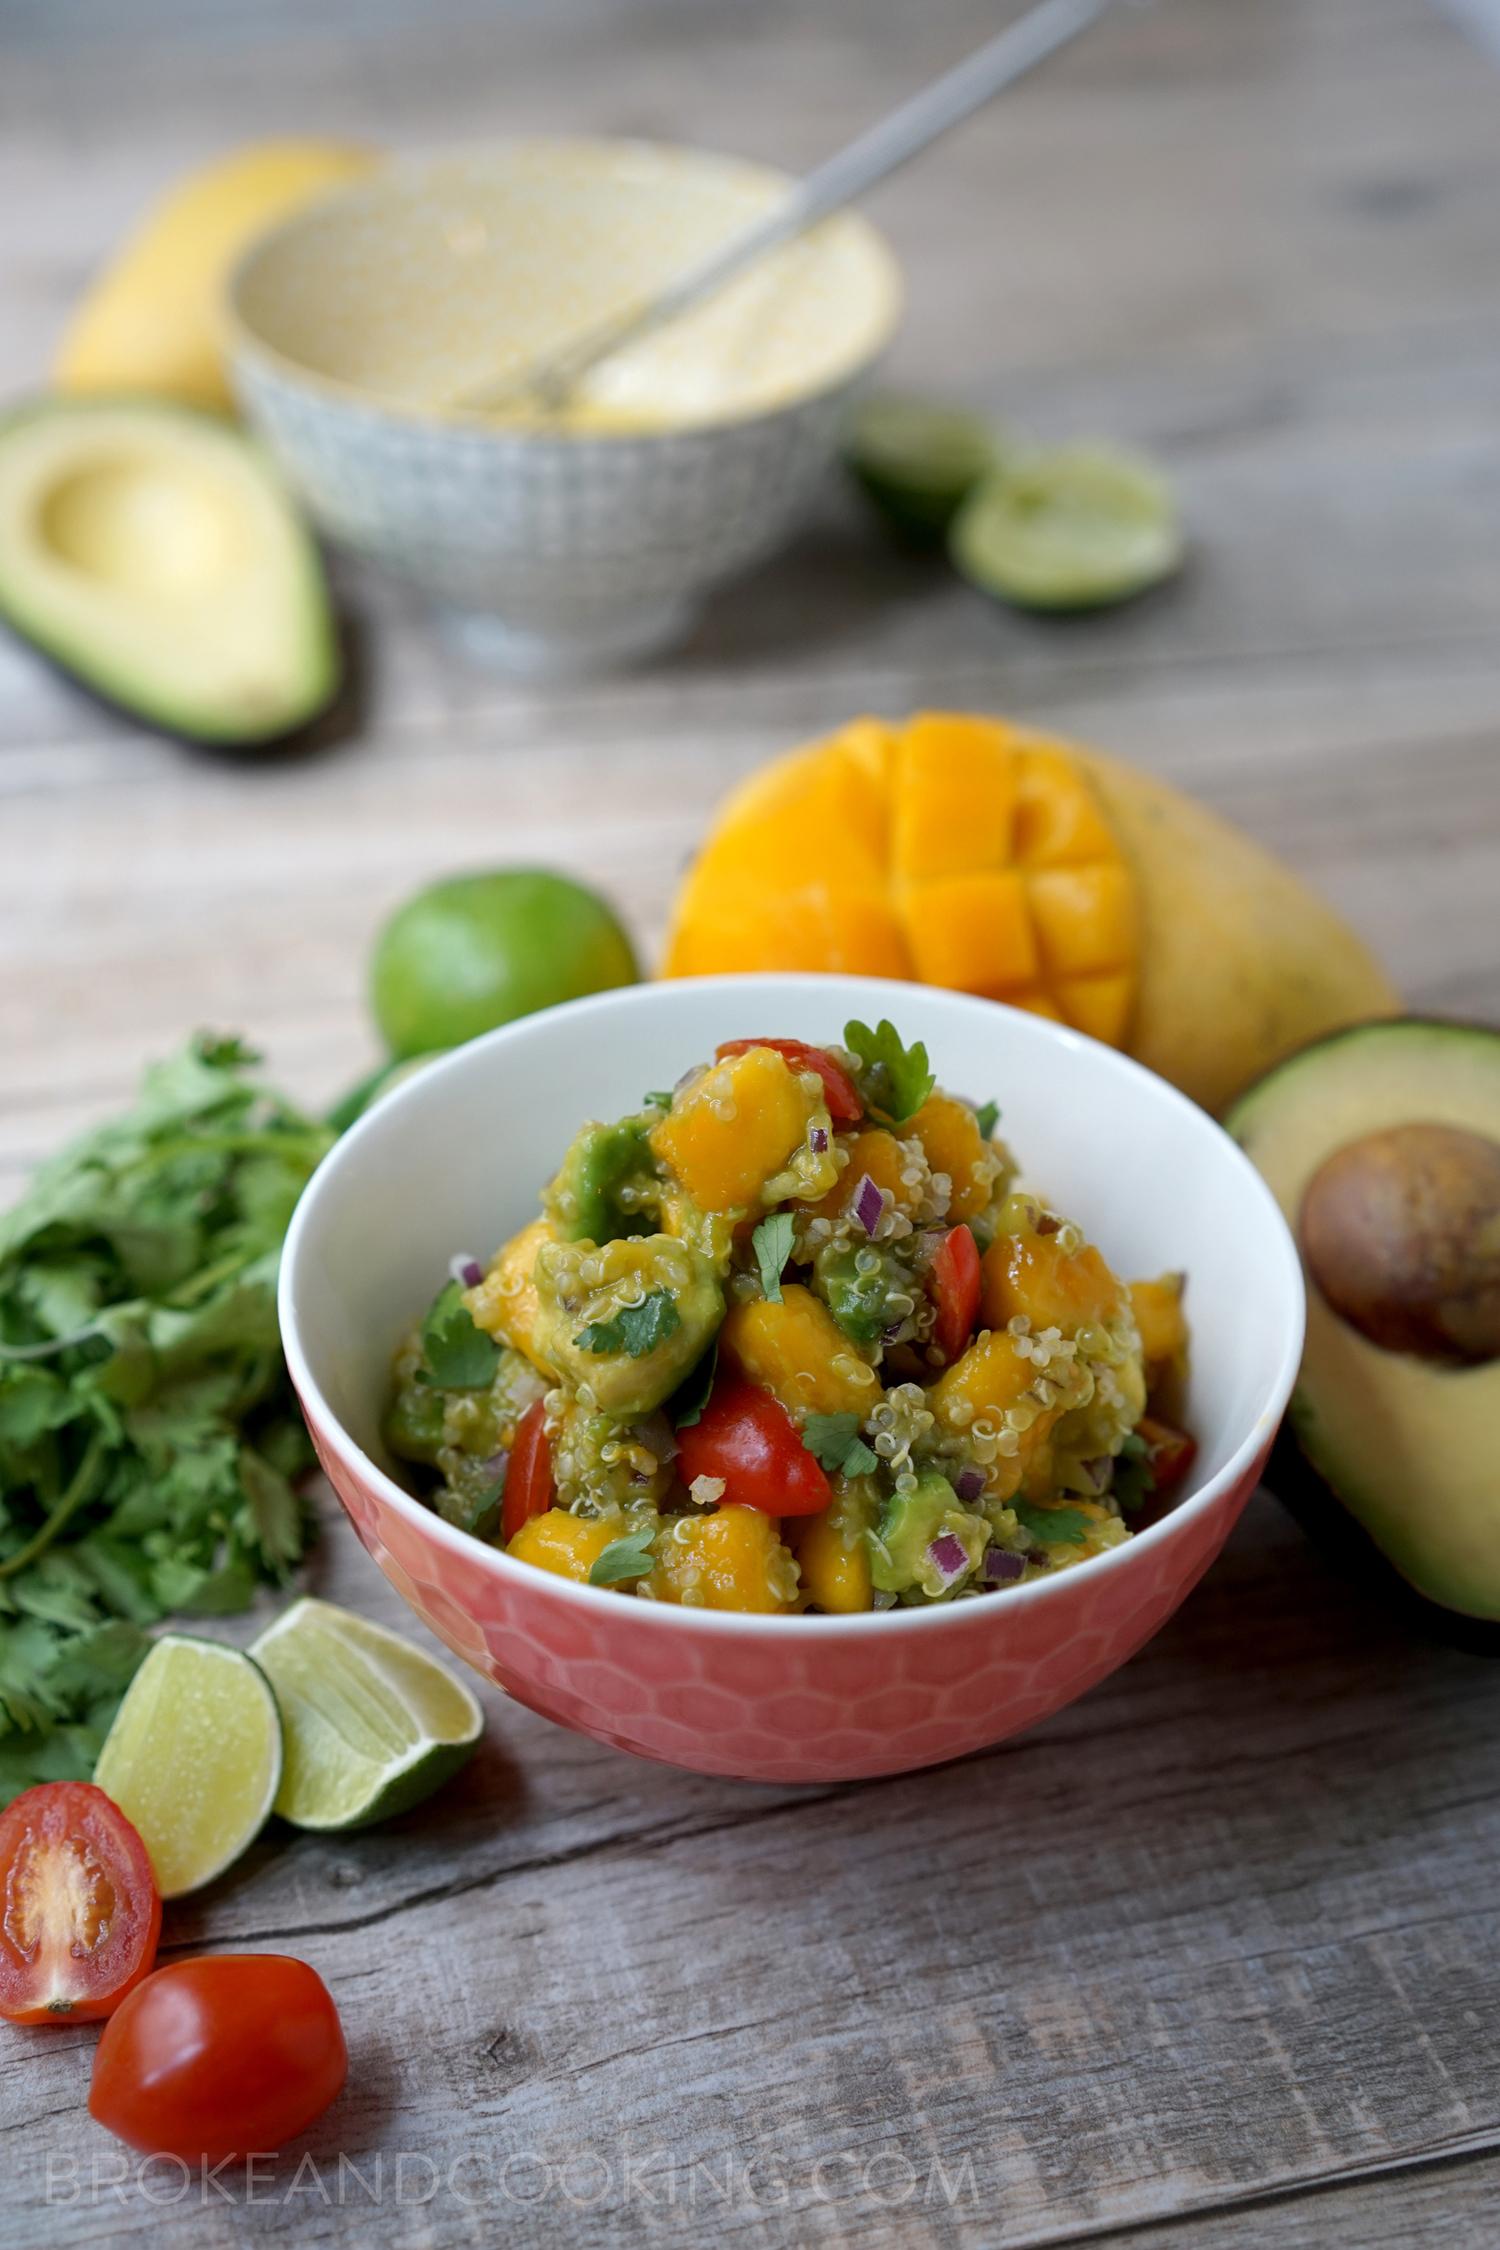 Mango Avocado Quinoa Salad With Lime Vinaigrette Broke And Cooking